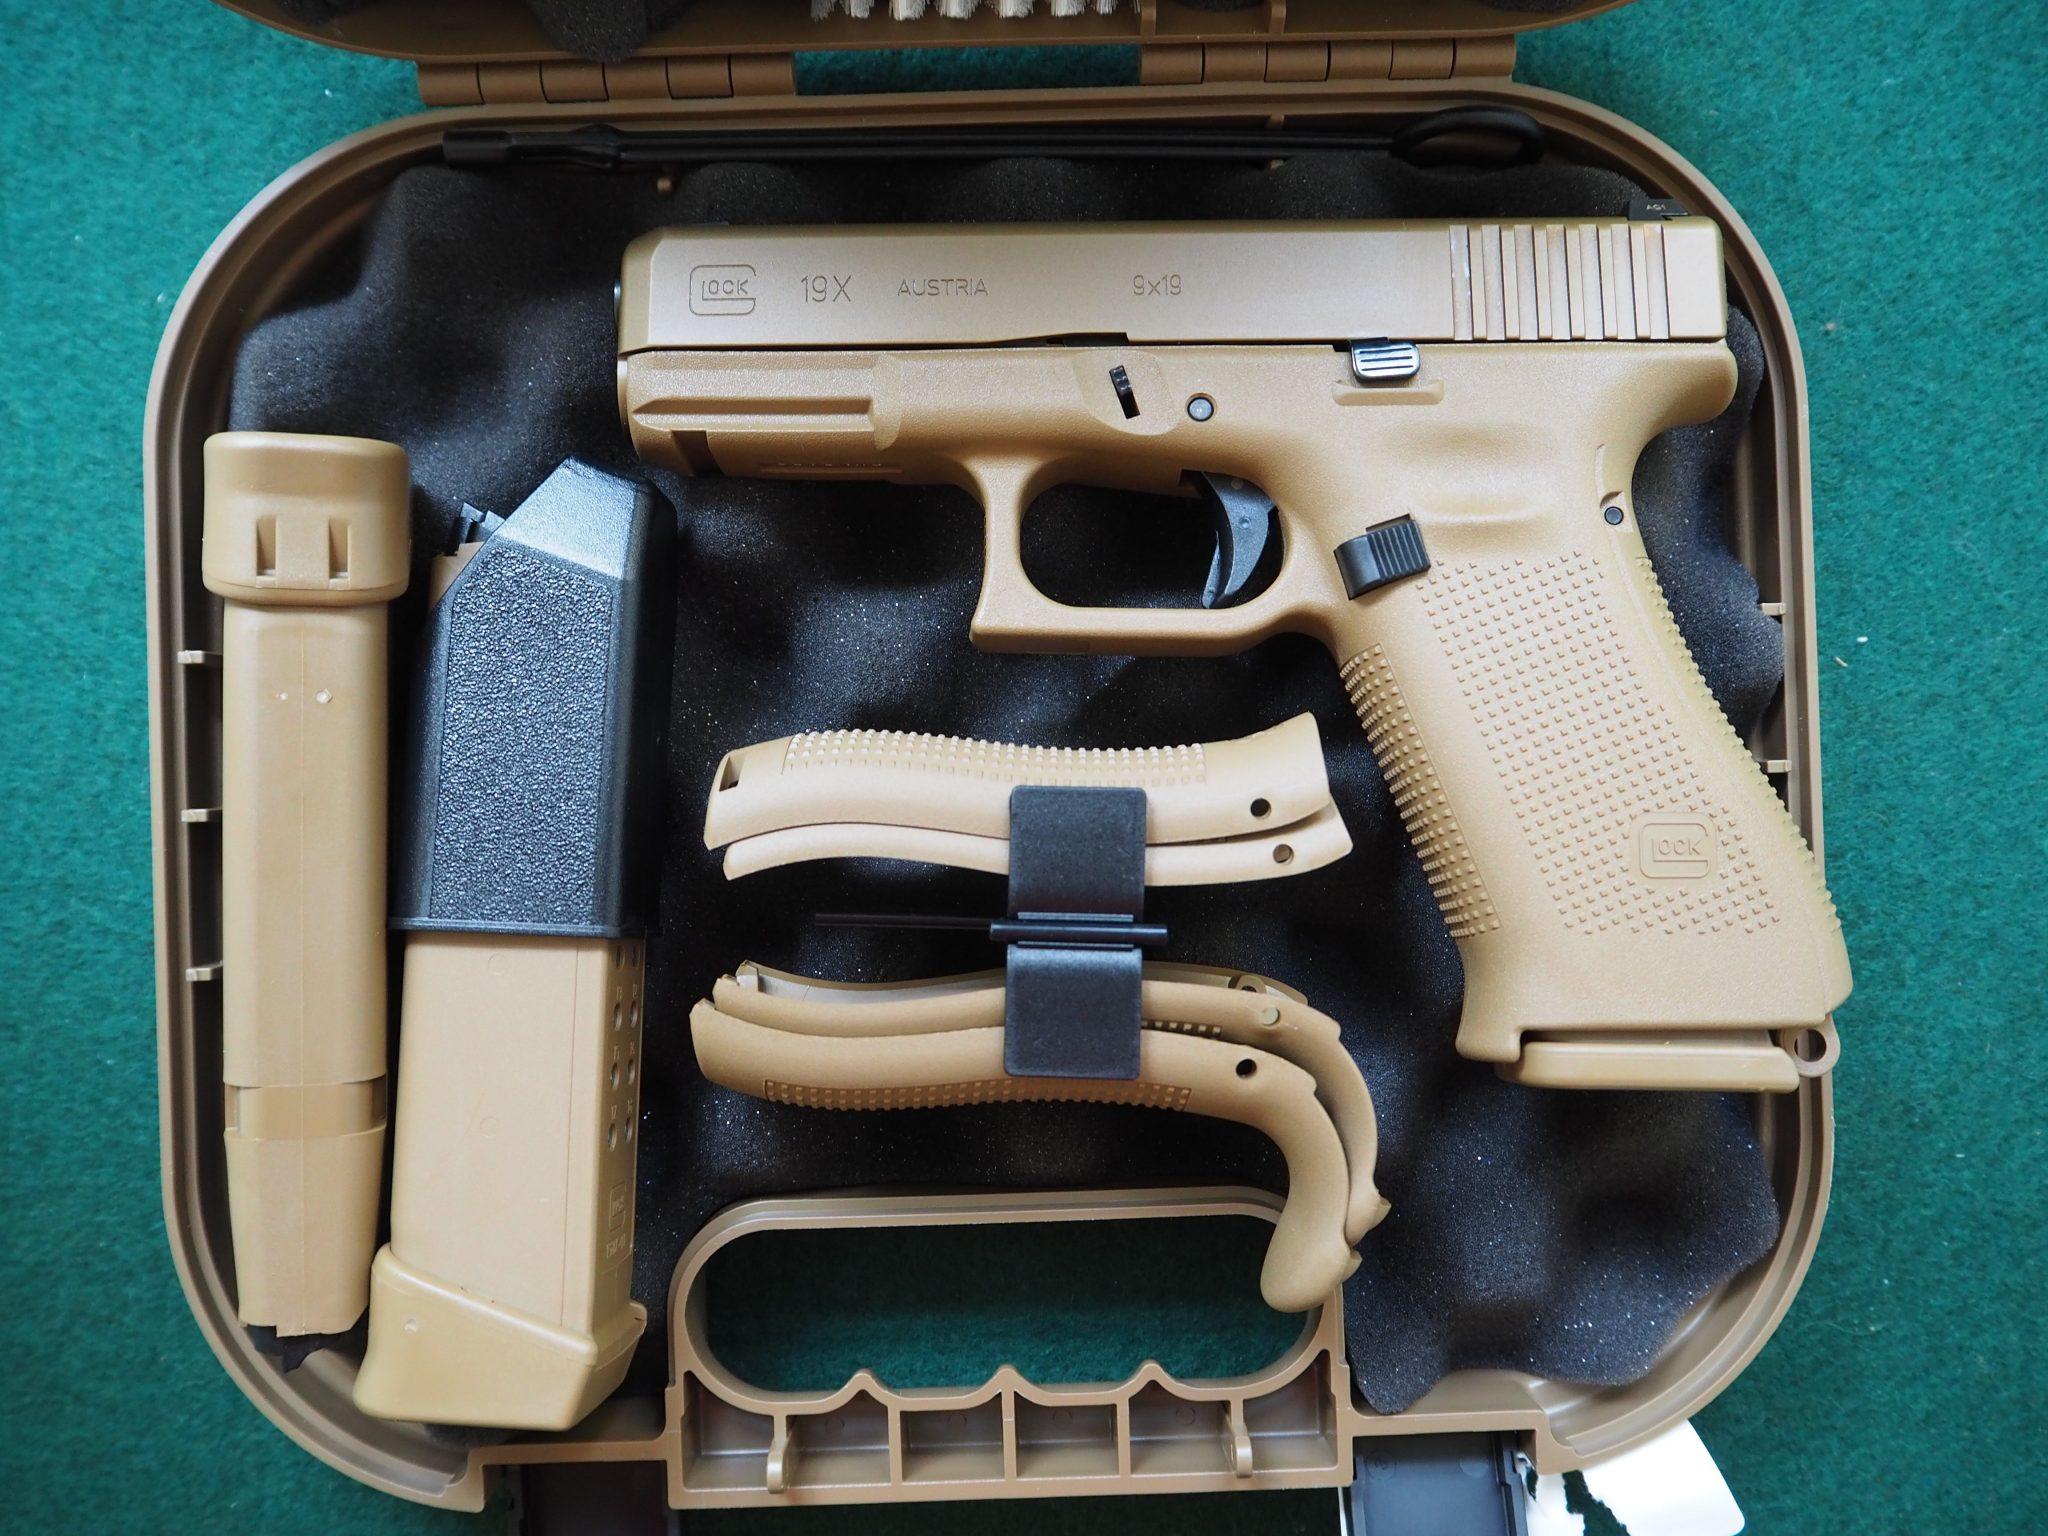 Glock 19x Gen 5